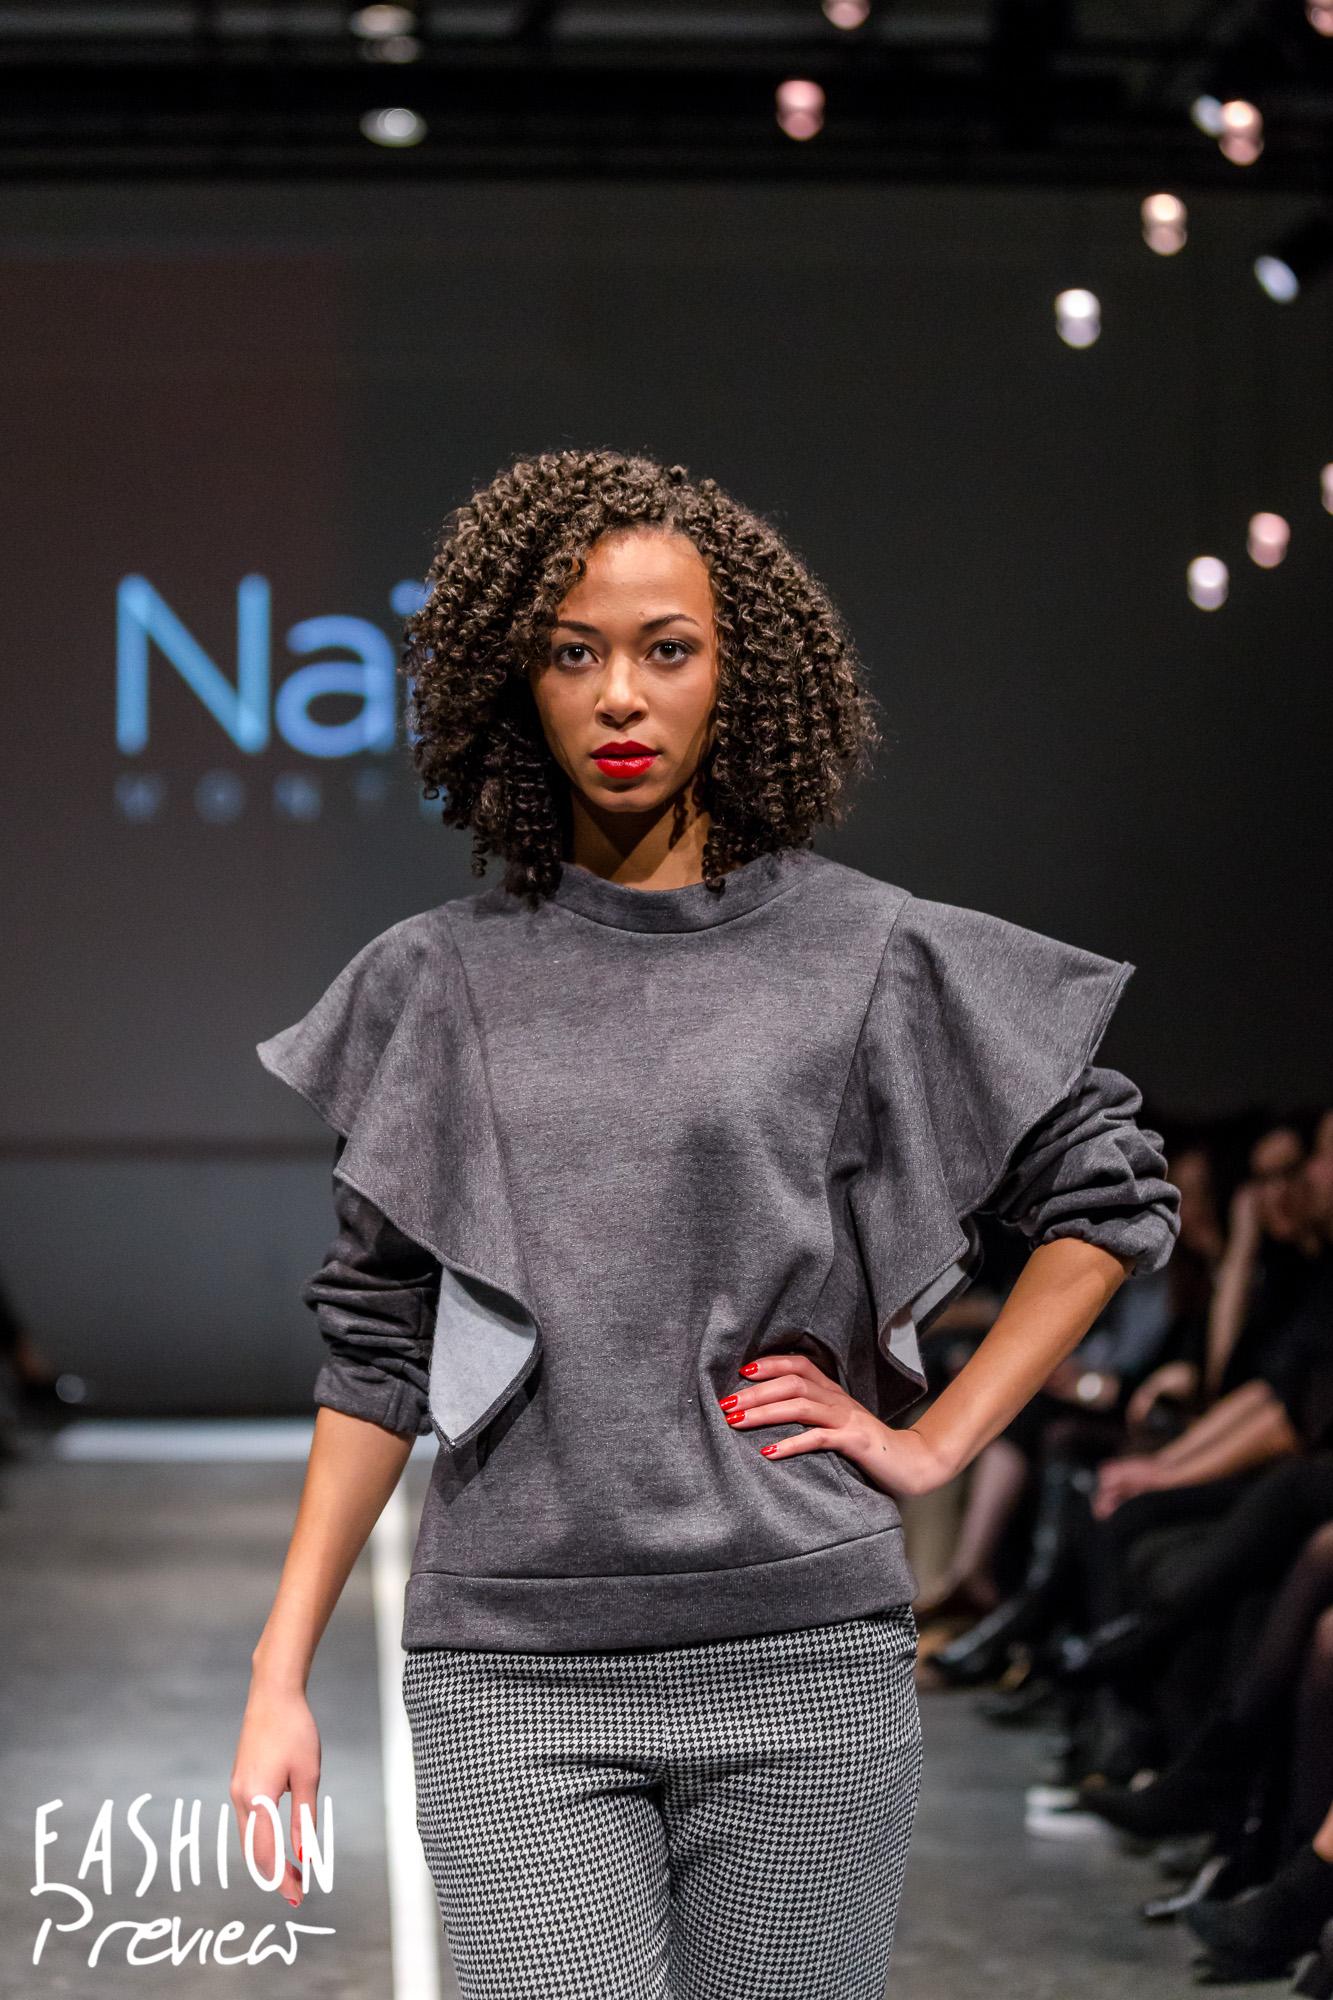 Fashion Preview 9 - Naike-22.jpg